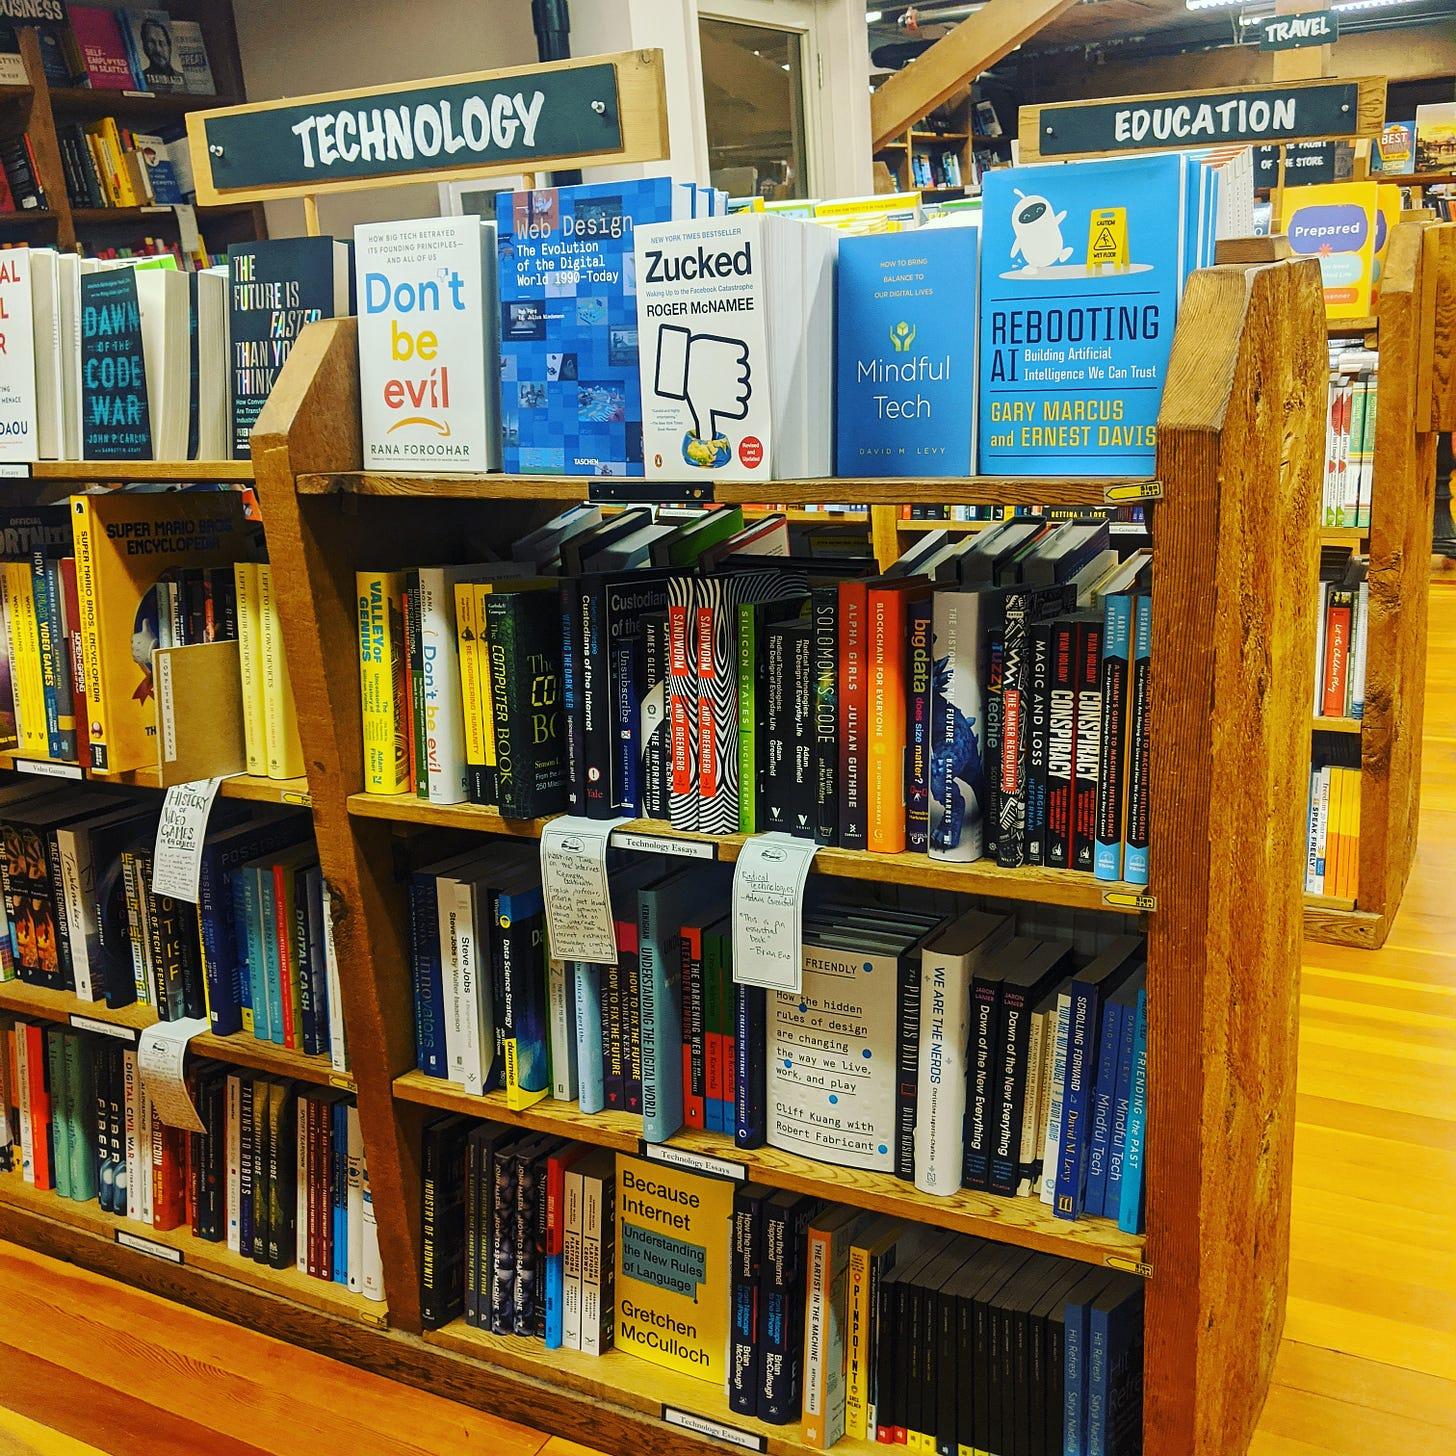 elliott bay books because internet technology section